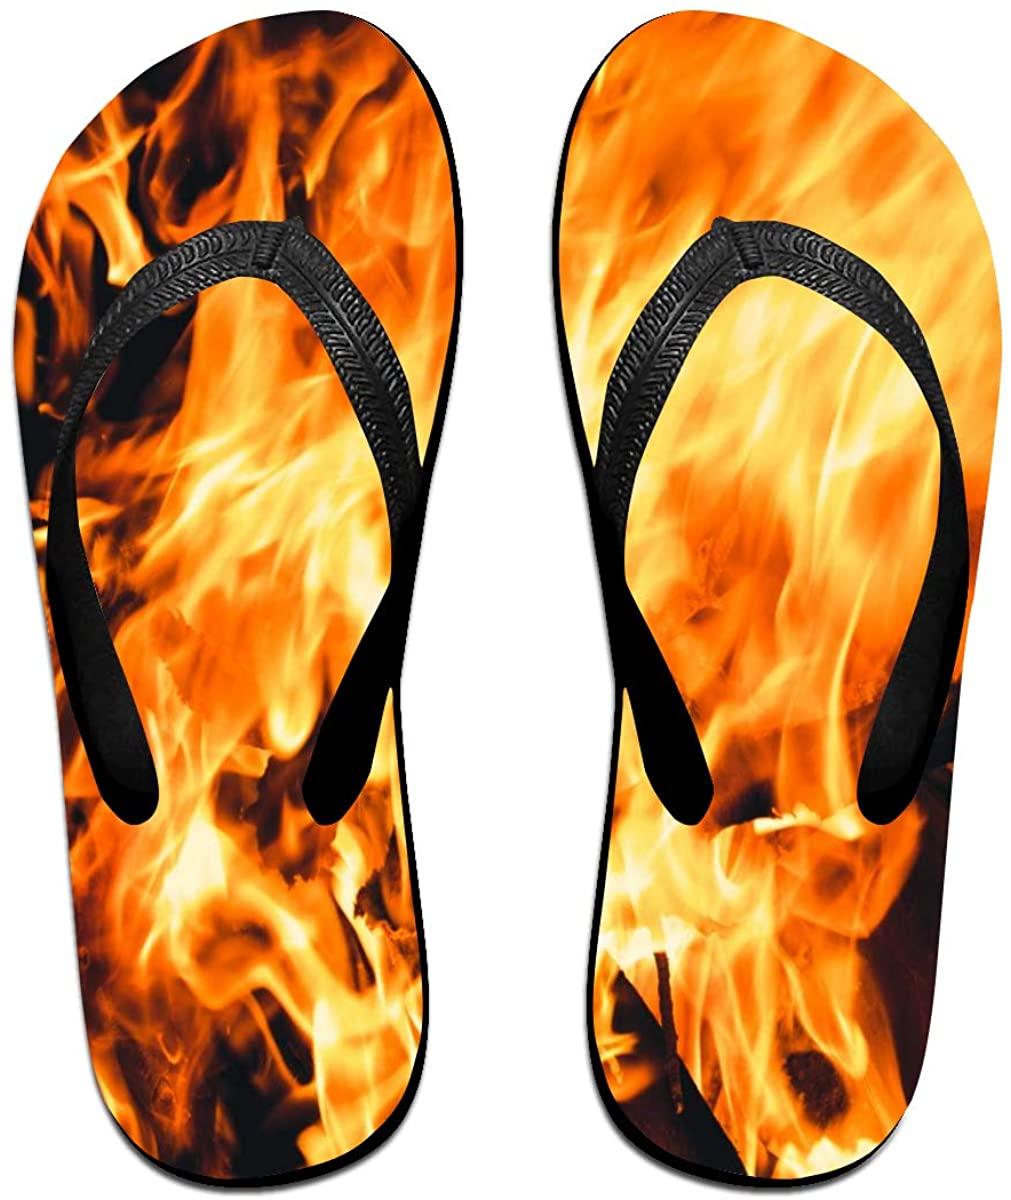 Mens Flip Flop Slippers Bright Flame of A Fire Rubber Cozy Flip Flops Outdoor Beach Sandals